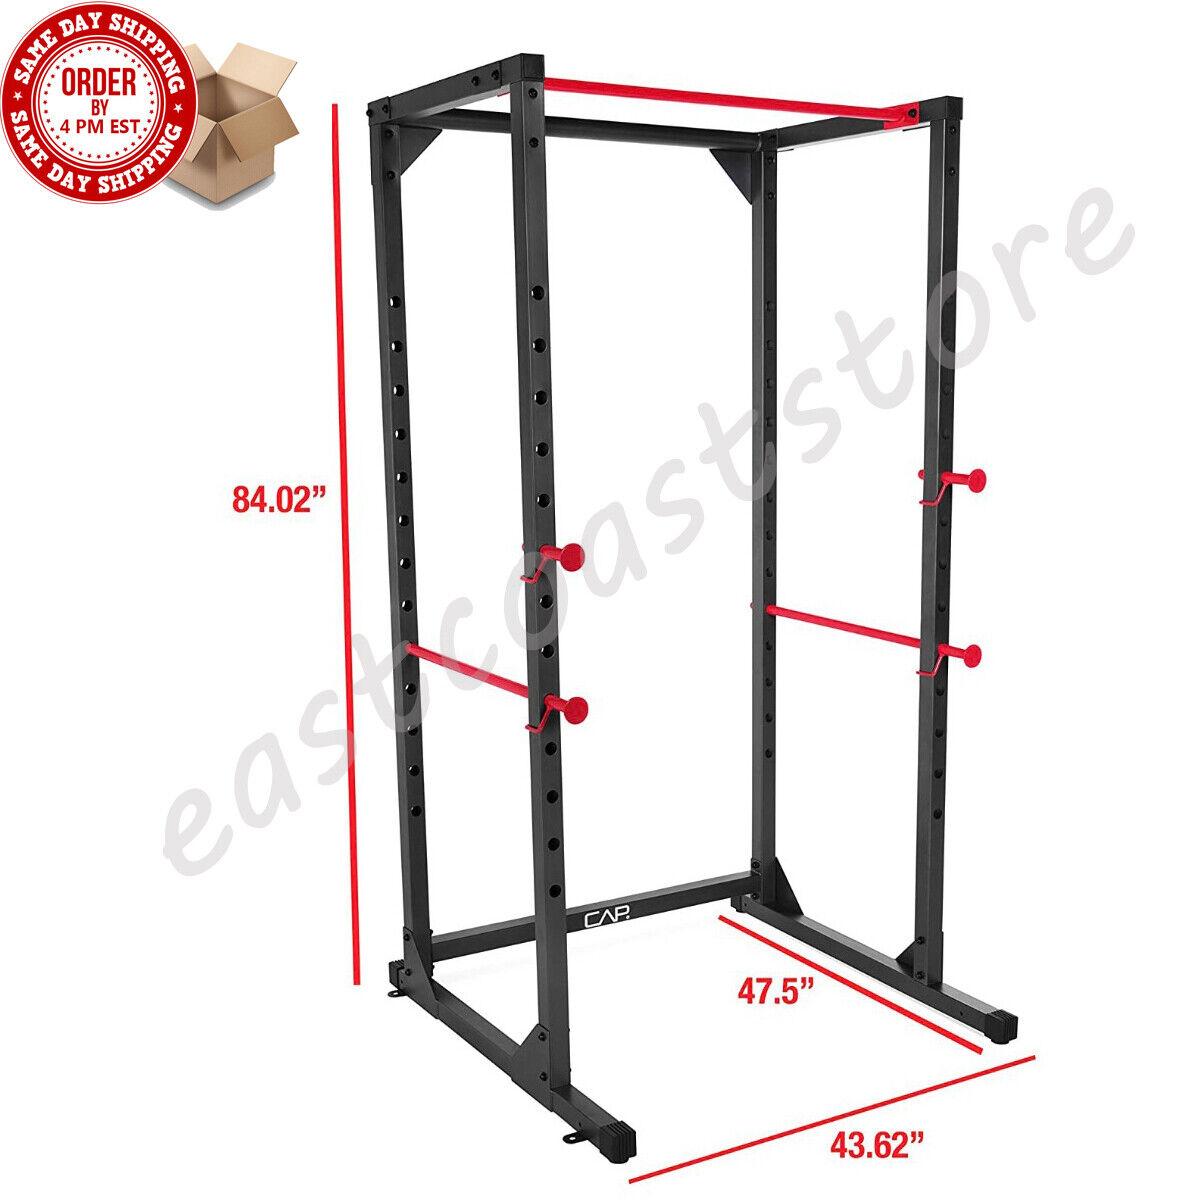 CAP Barbell Full Cage 7' foot Power Rack Squat Rack Bench Pr